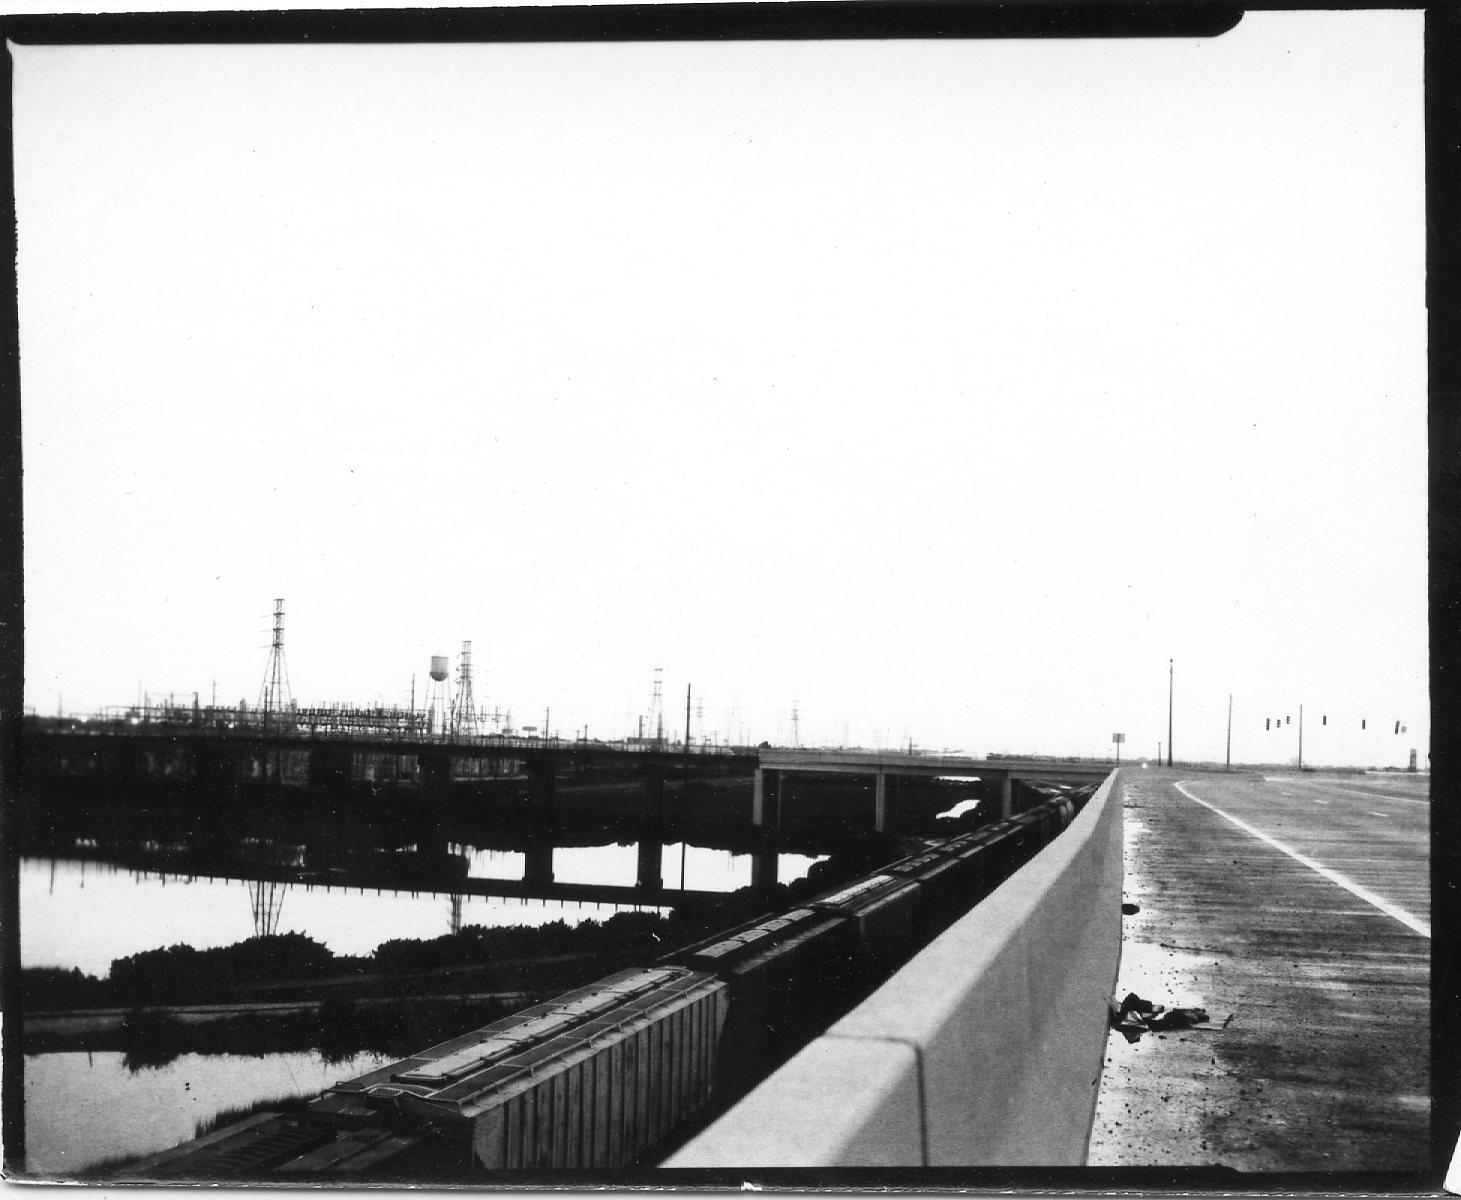 Galveston006.jpg